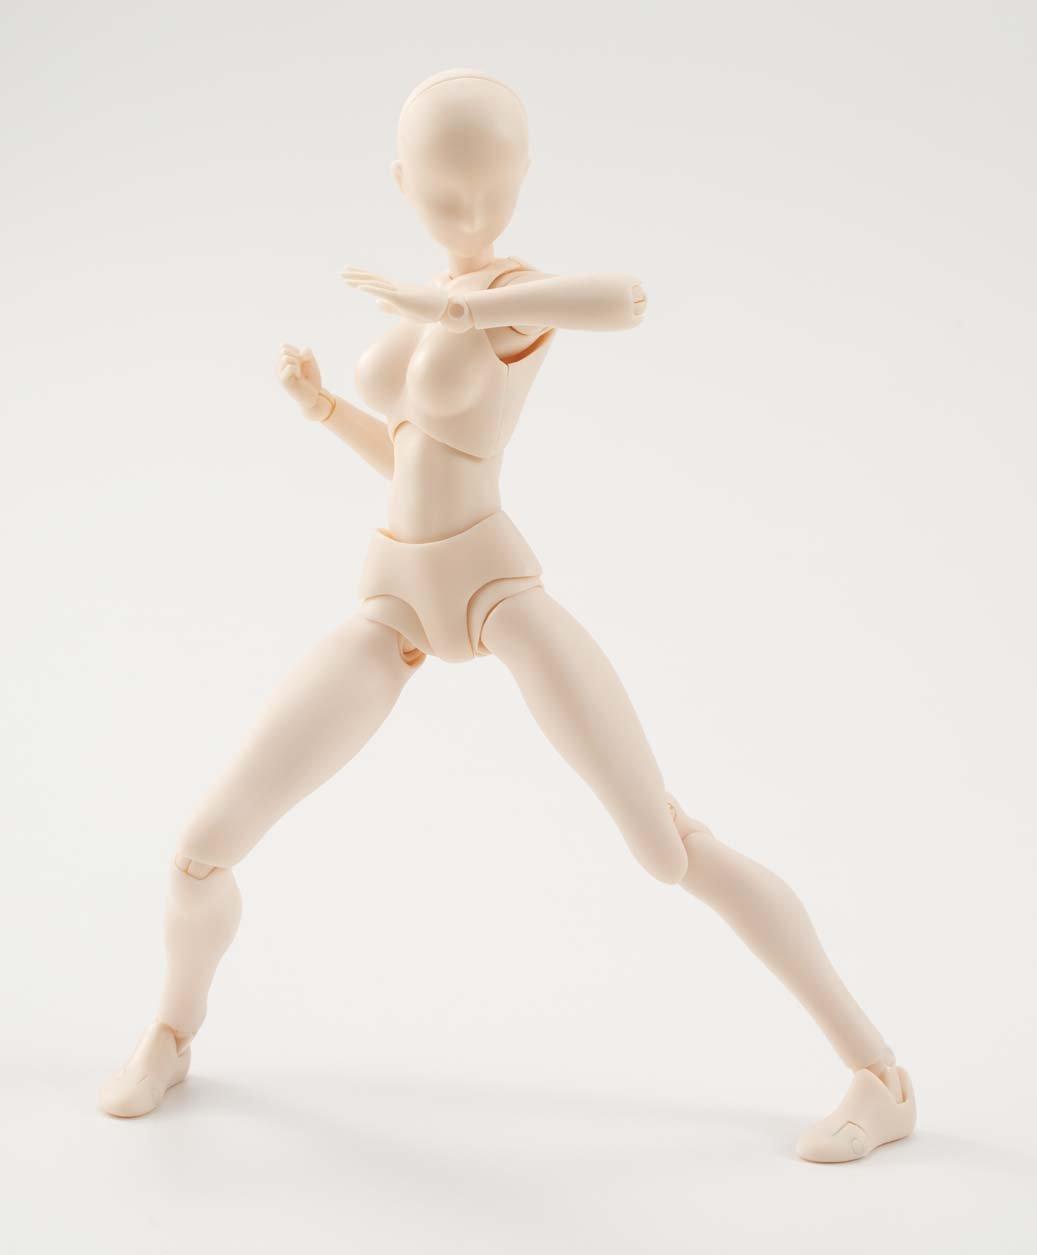 Body Chan Bandai Figurine S.H.Figuarts Female Pale Orange Color Version 4549660040873 Bandai Japan JAN162488